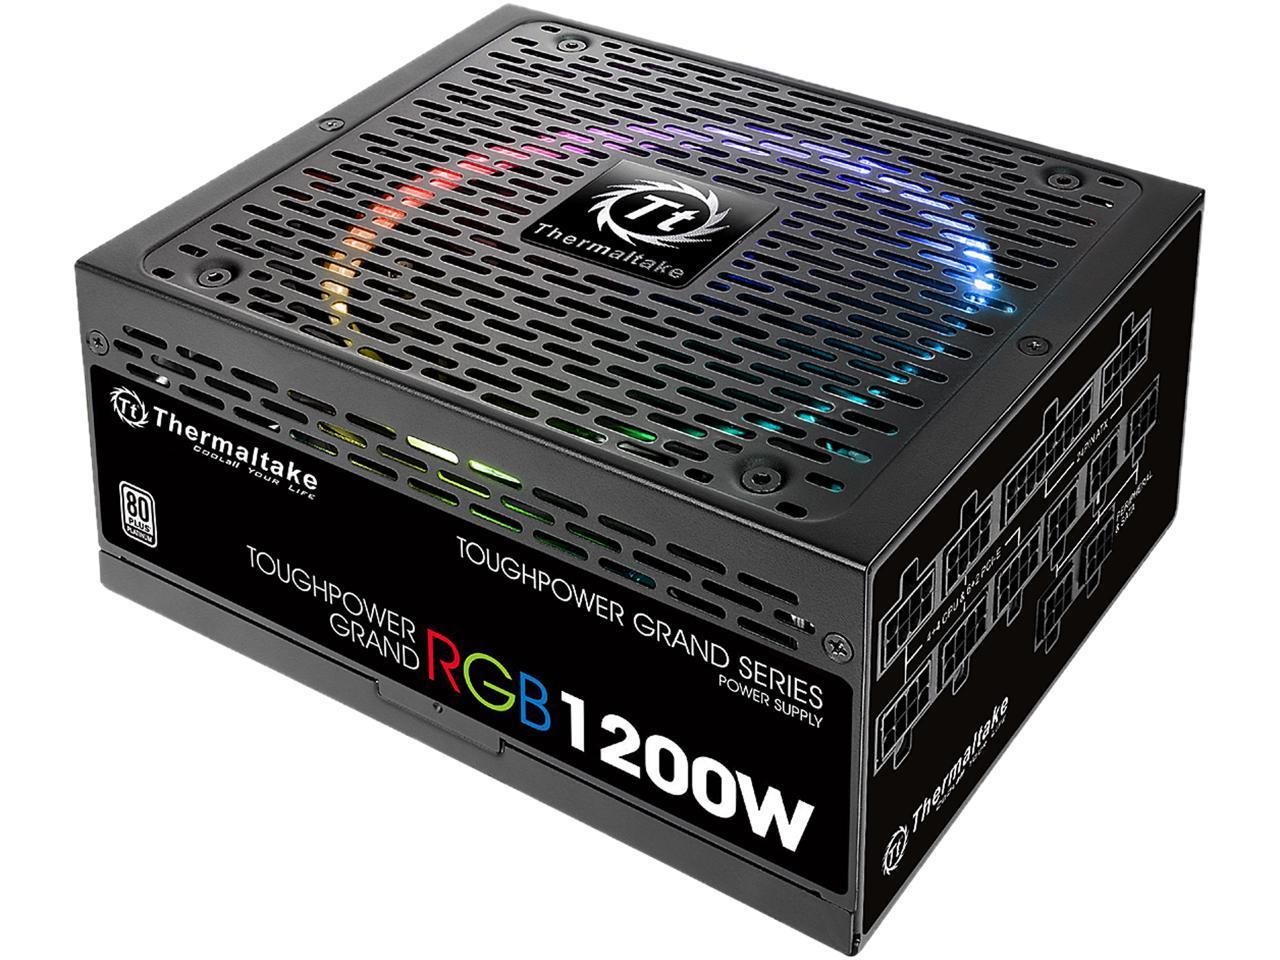 Thermaltake Toughpower Grand RGB 1200W SLI/CrossFire Ready Continuous Power RGB LED Smart Zero Fan ATX12V v2.4 / EPS v2.92 80 PLUS PLATINUM Certified 10 Year Warranty Full Modular Power Supply PS-TPG-1200F1FAPU-1